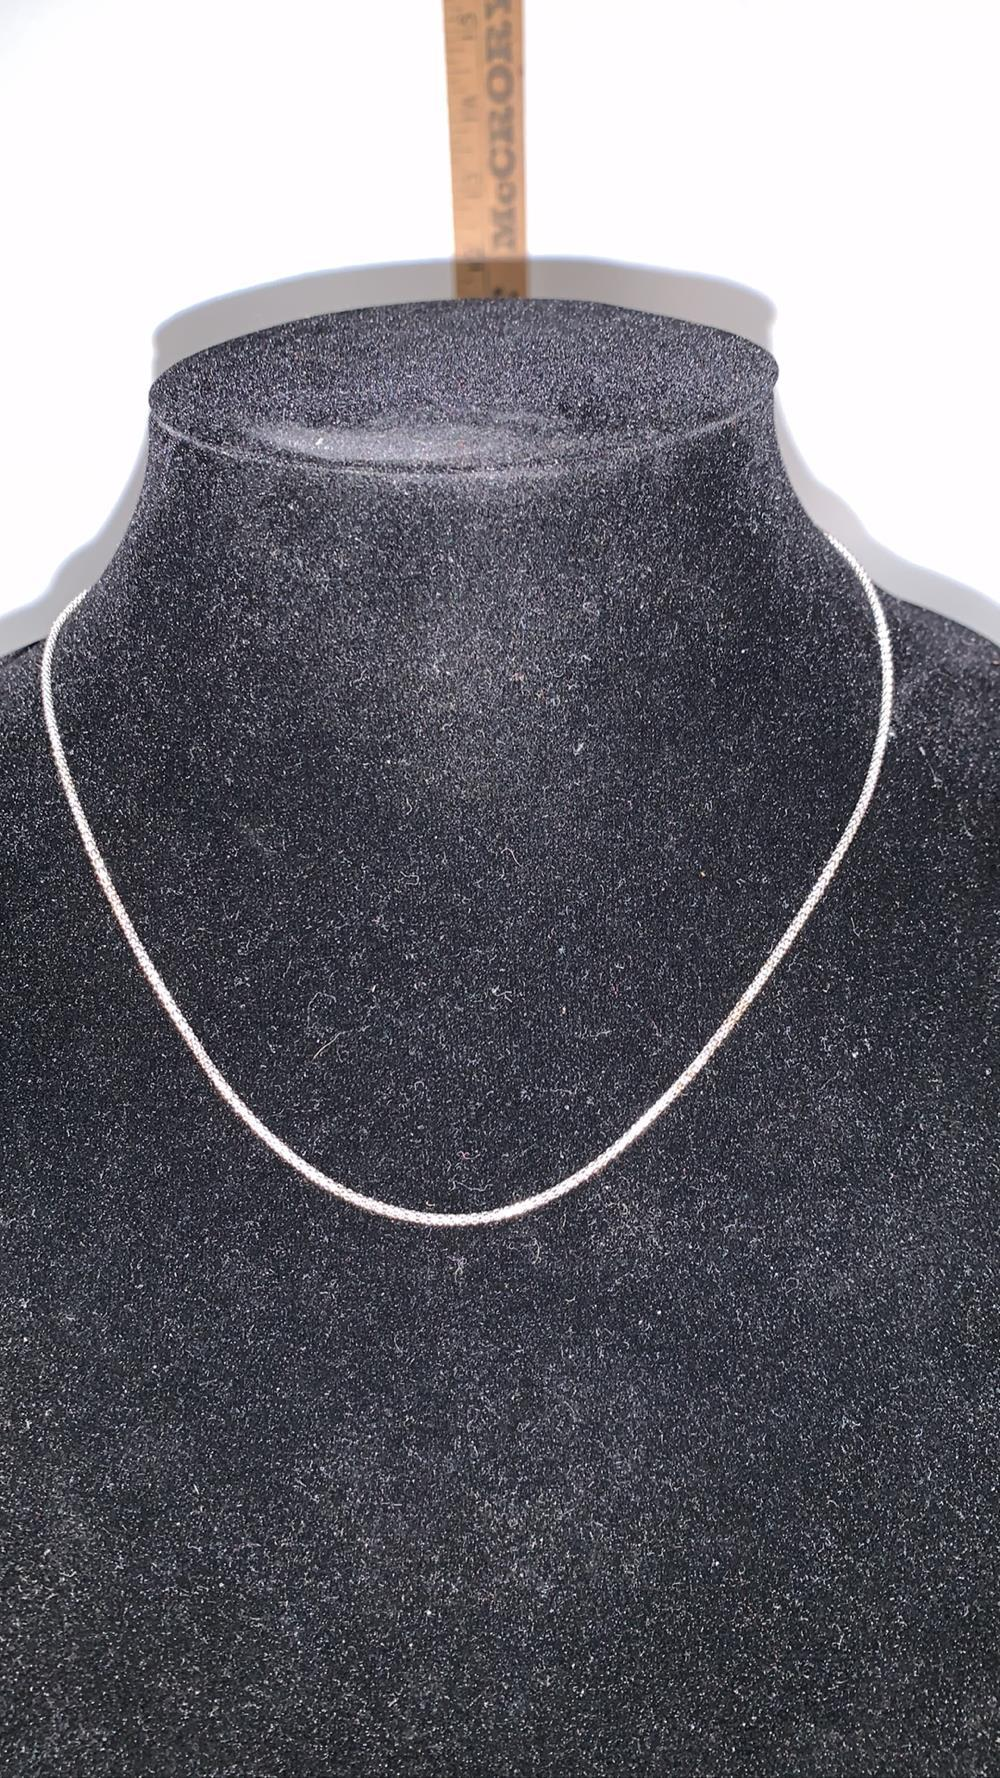 .925 Silver Chain